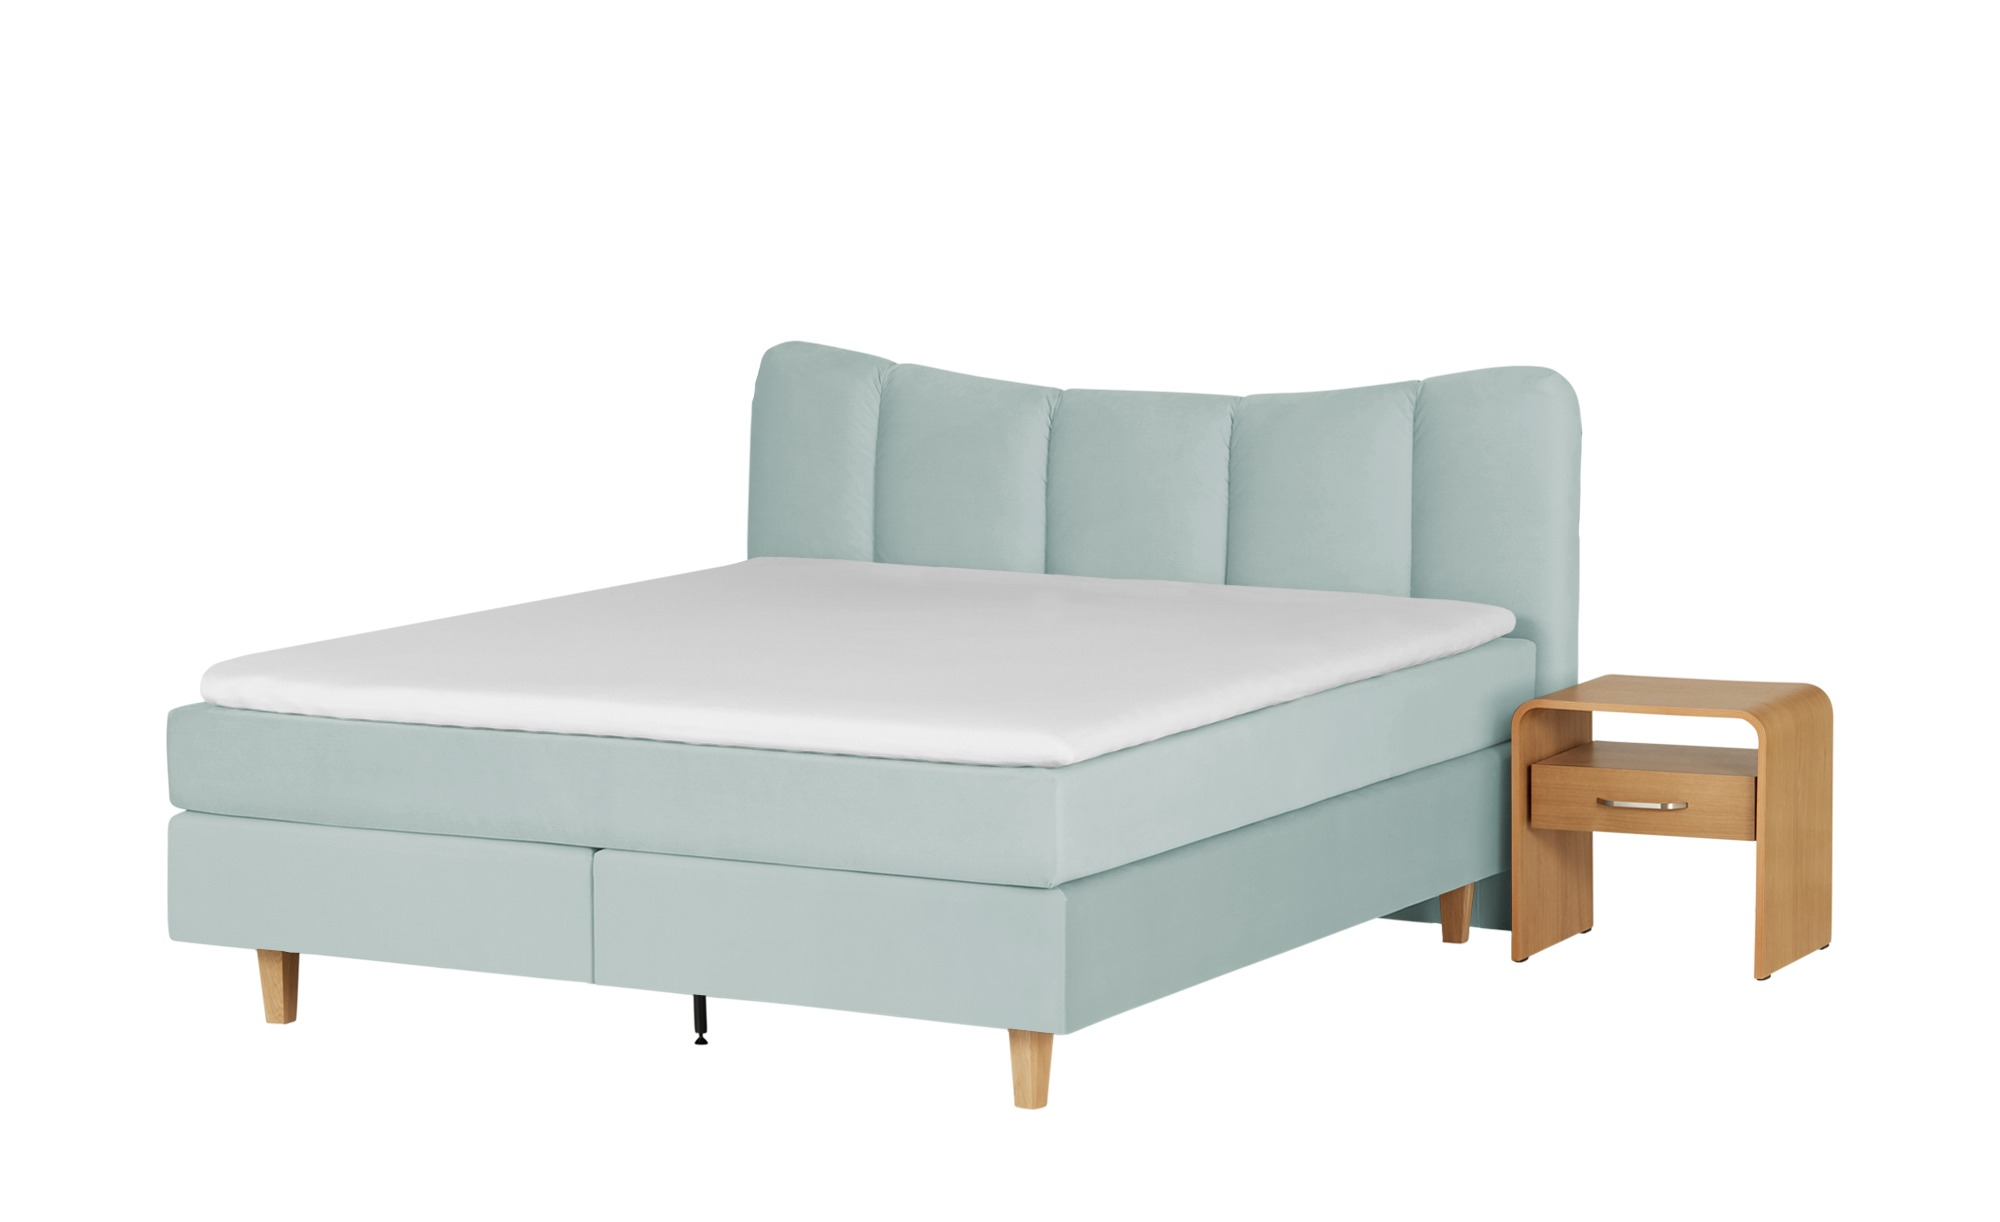 *Boxspringbett  Dalur 200 x 200 cm Eisblau – SKAGEN BEDS*